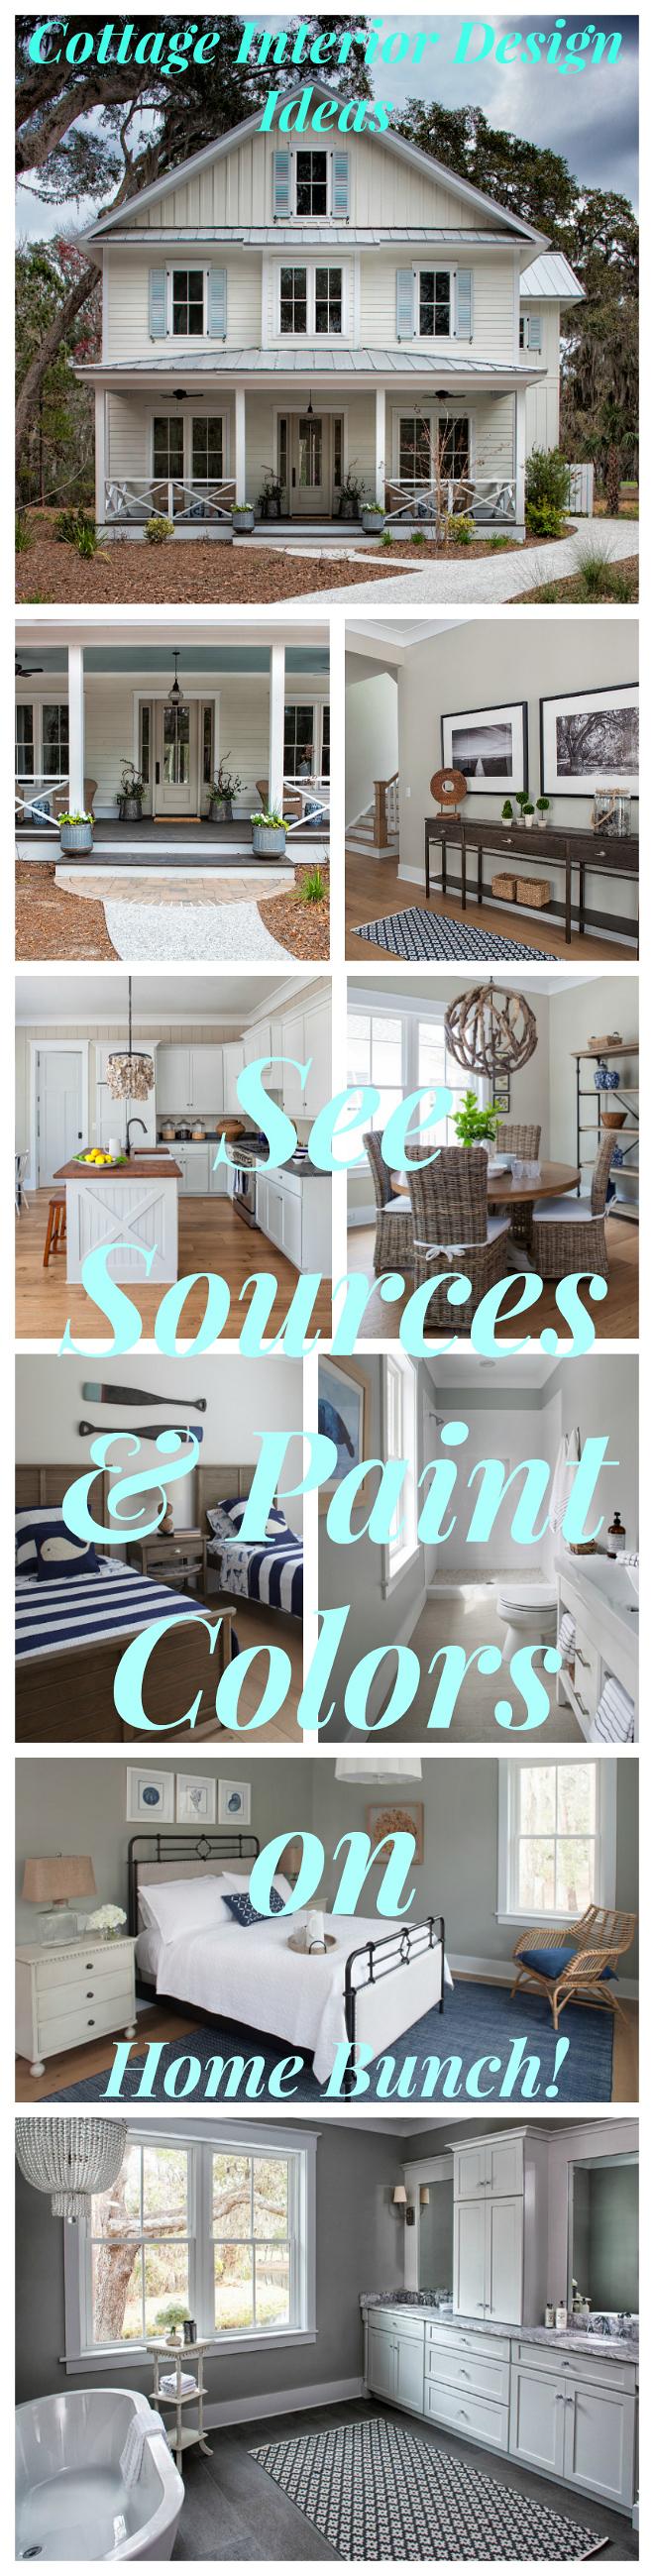 Cottage Interior Design Ideas. Cottage Interior Design Ideas. Cottage Interior Design Ideas #CottageInteriorDesign #CottageInteriorDesignIdeas